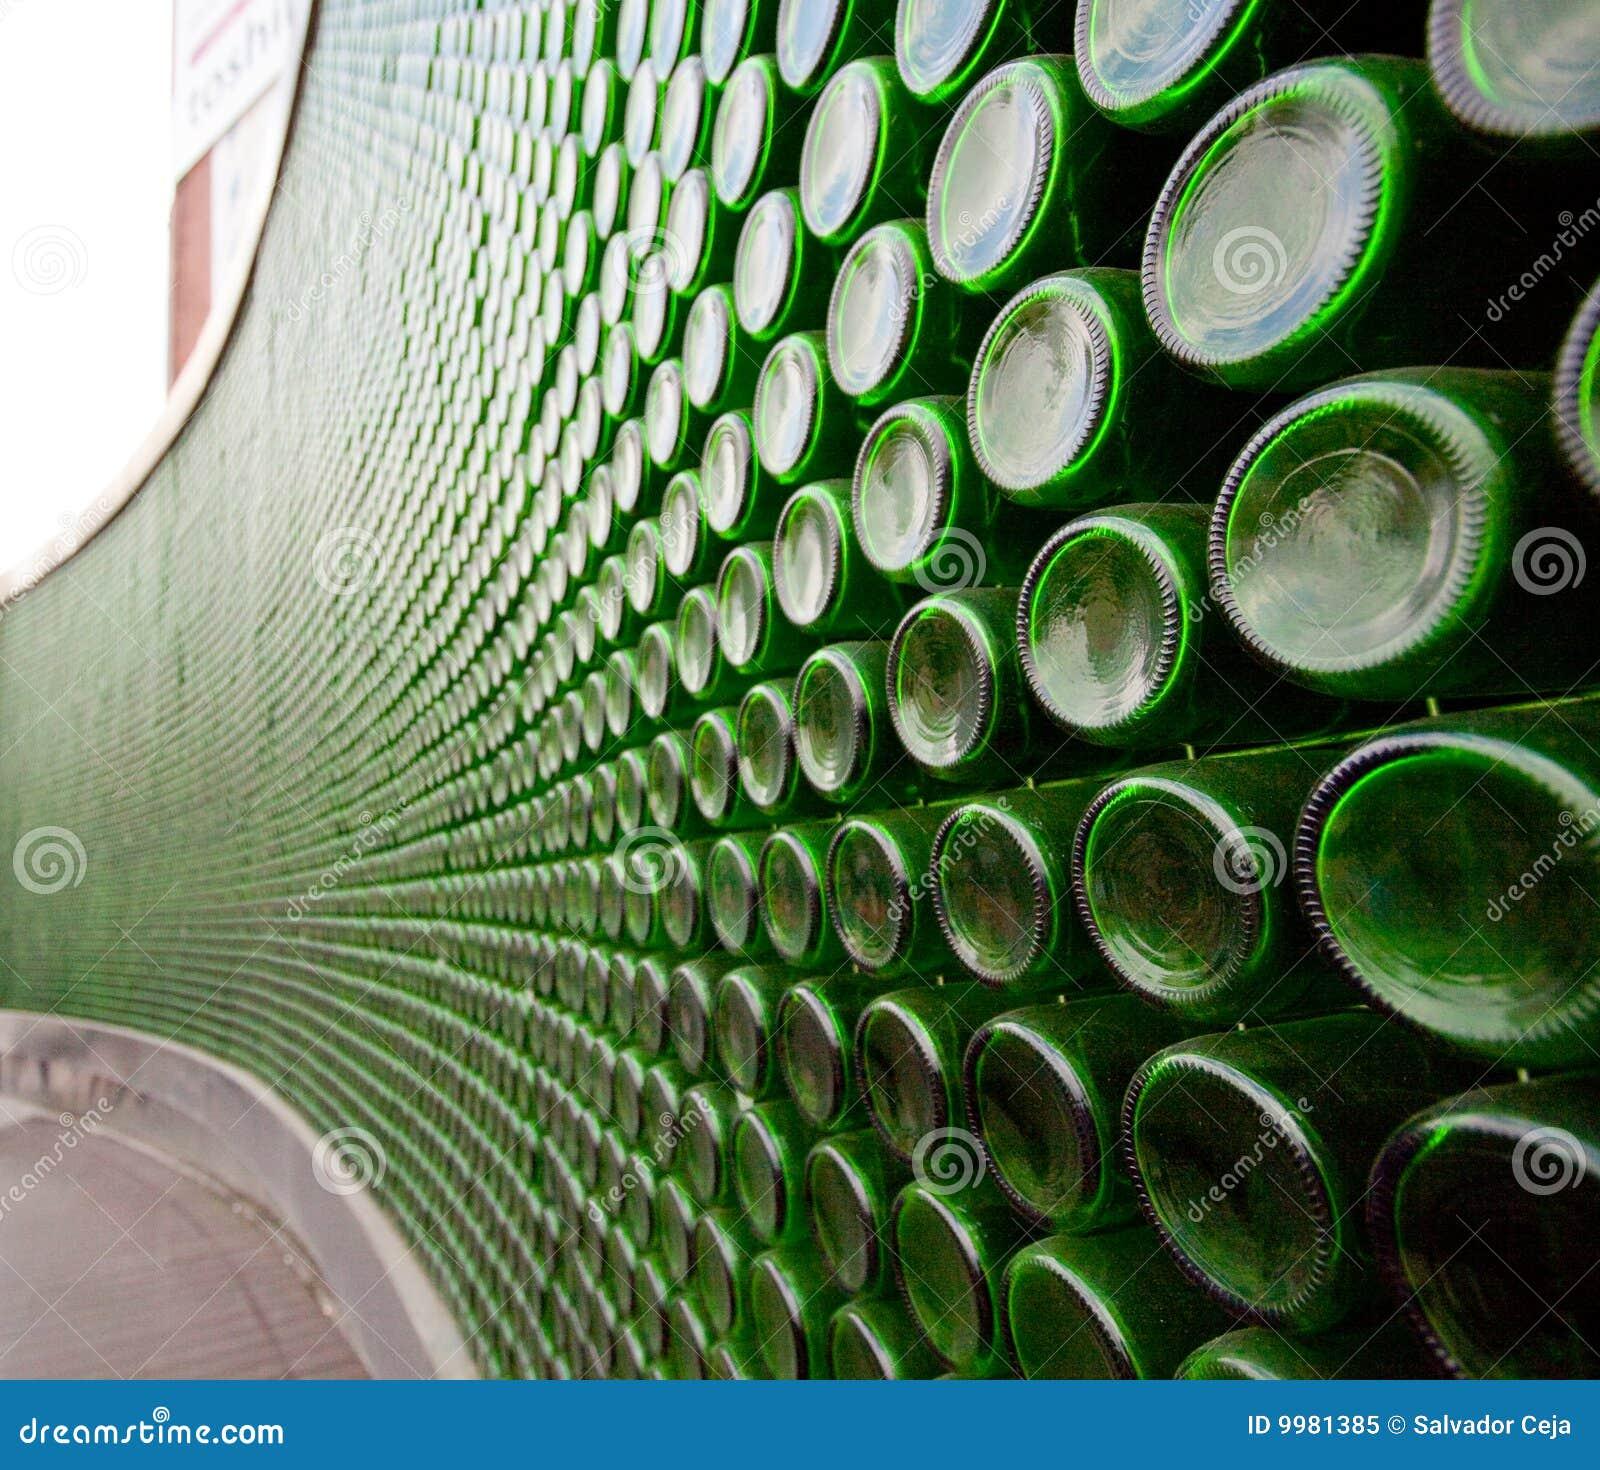 green glass bottle wall 9981385